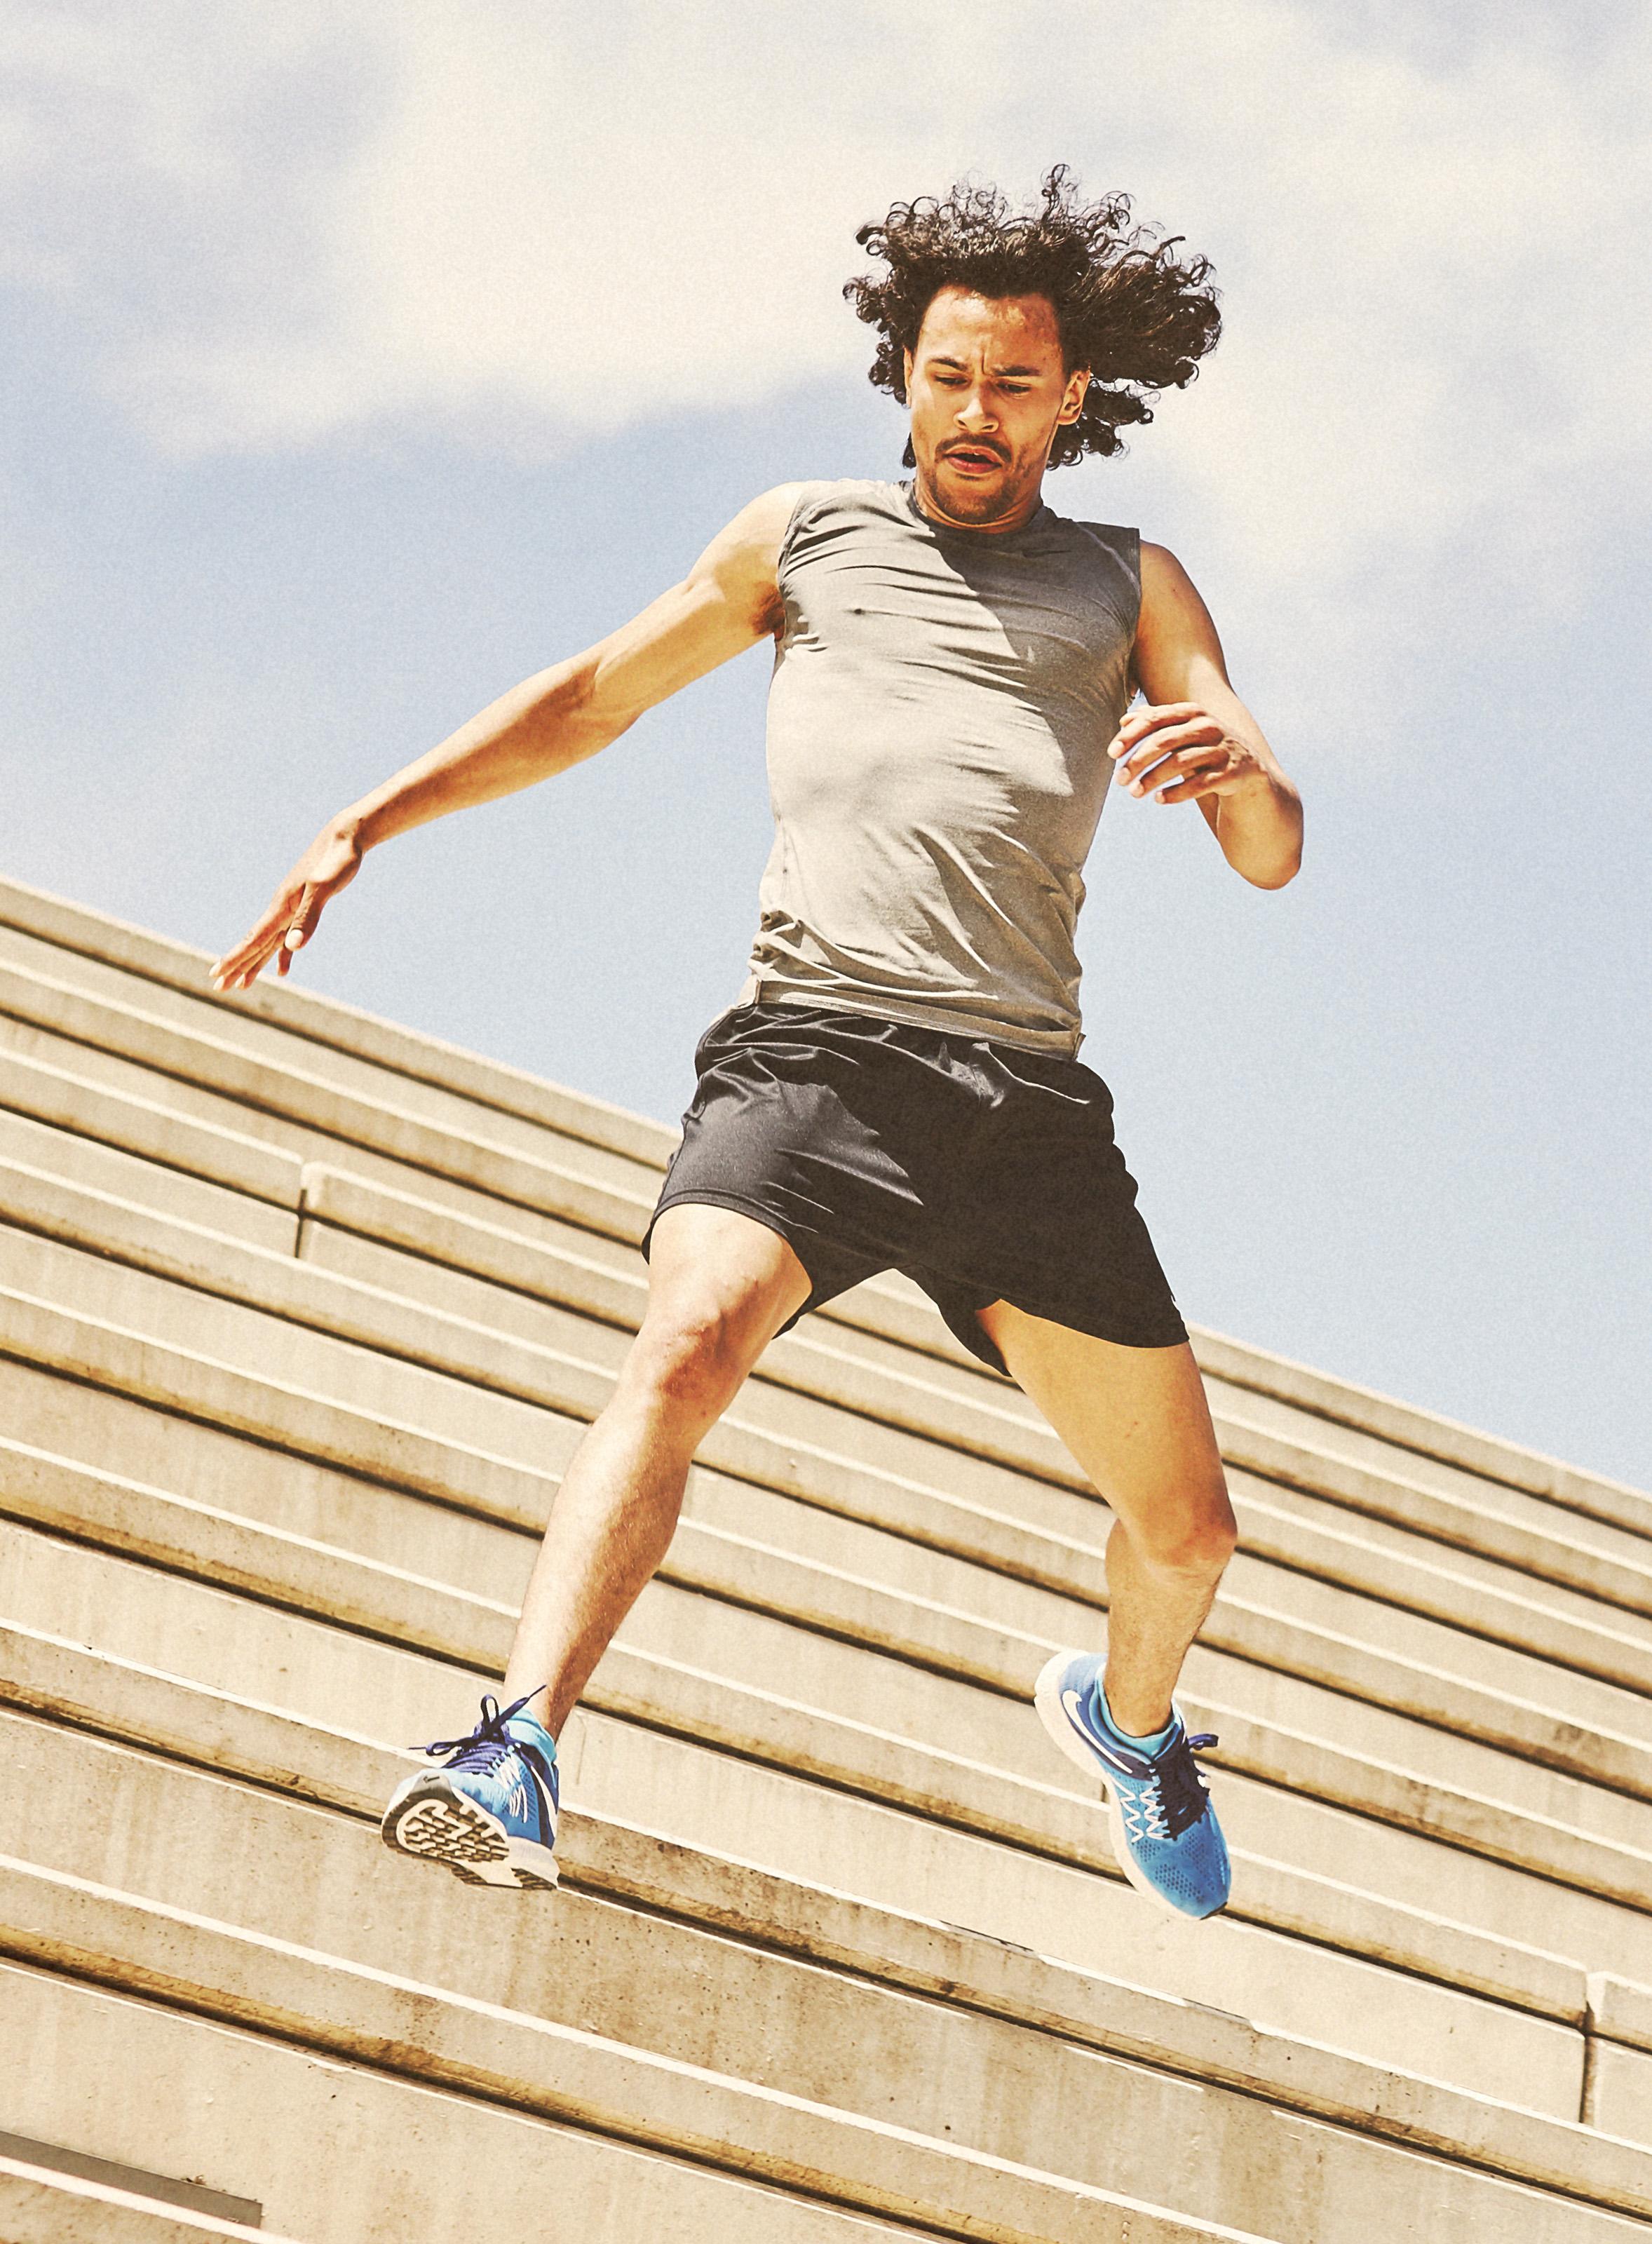 athlete caught mid flight running down stairs